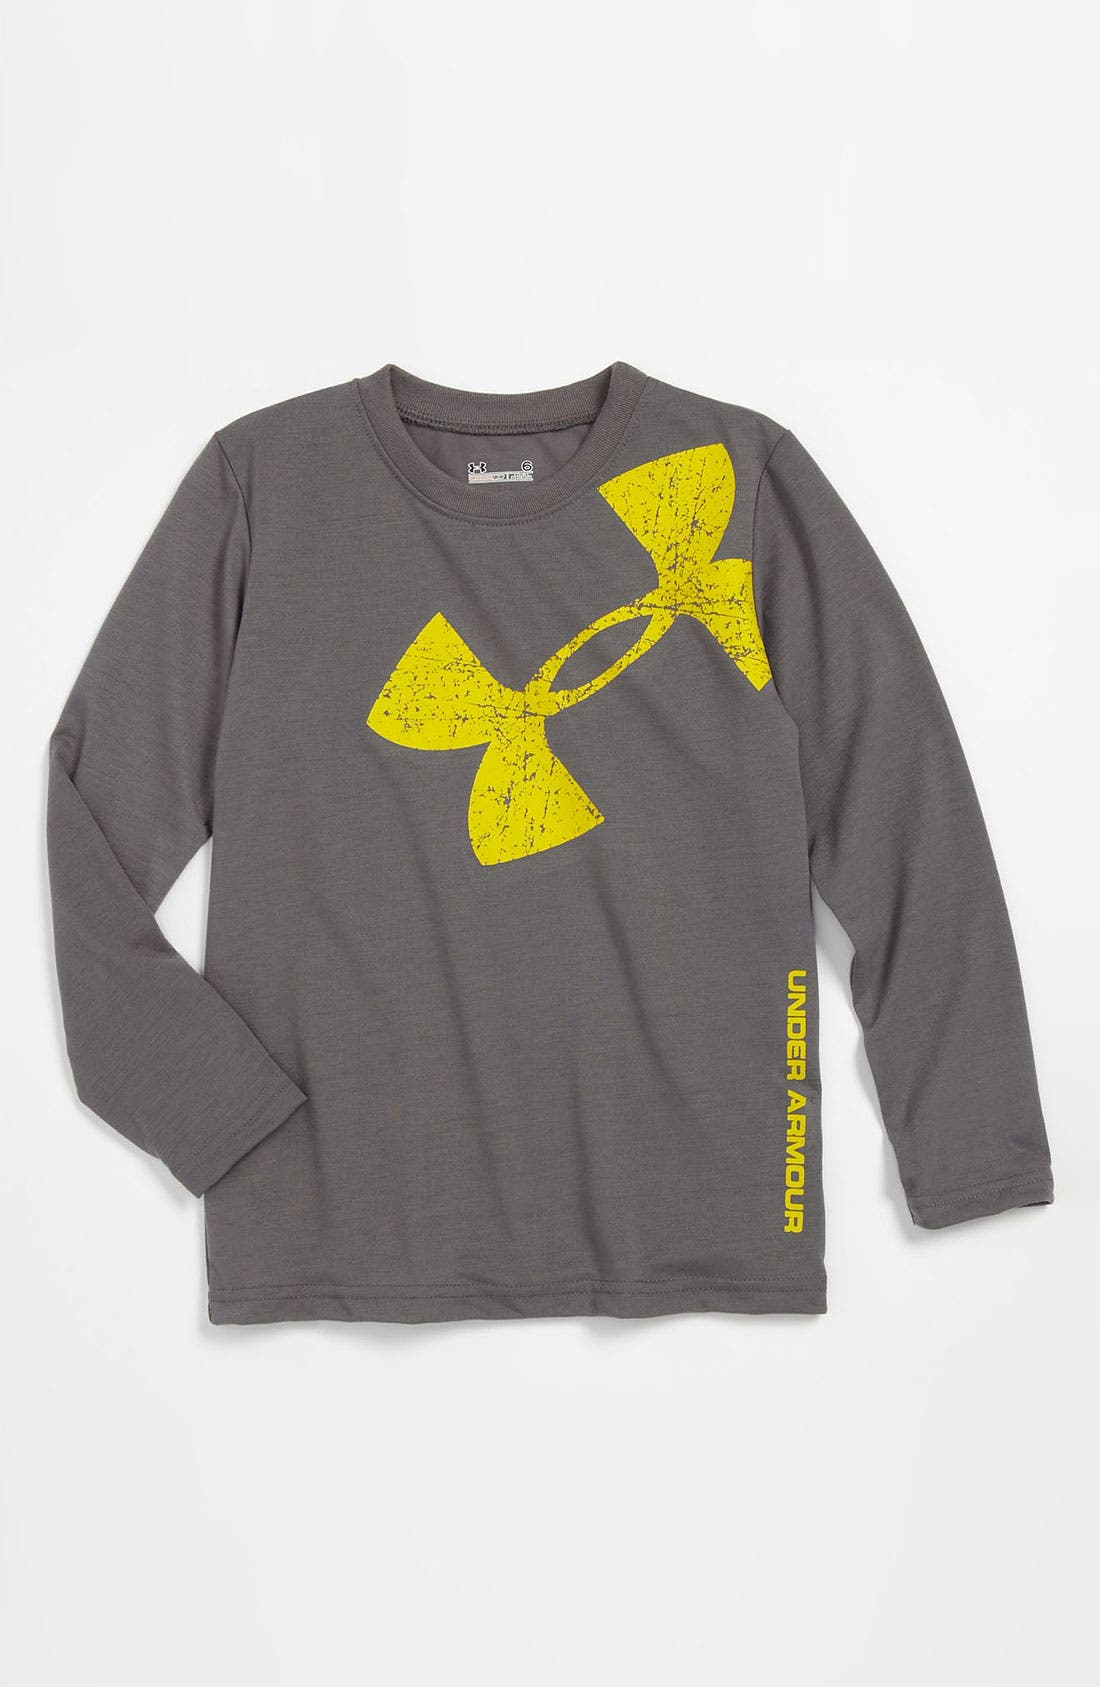 Main Image - Under Armour 'Big Icon' All Season Gear® T-Shirt (Little Boys)